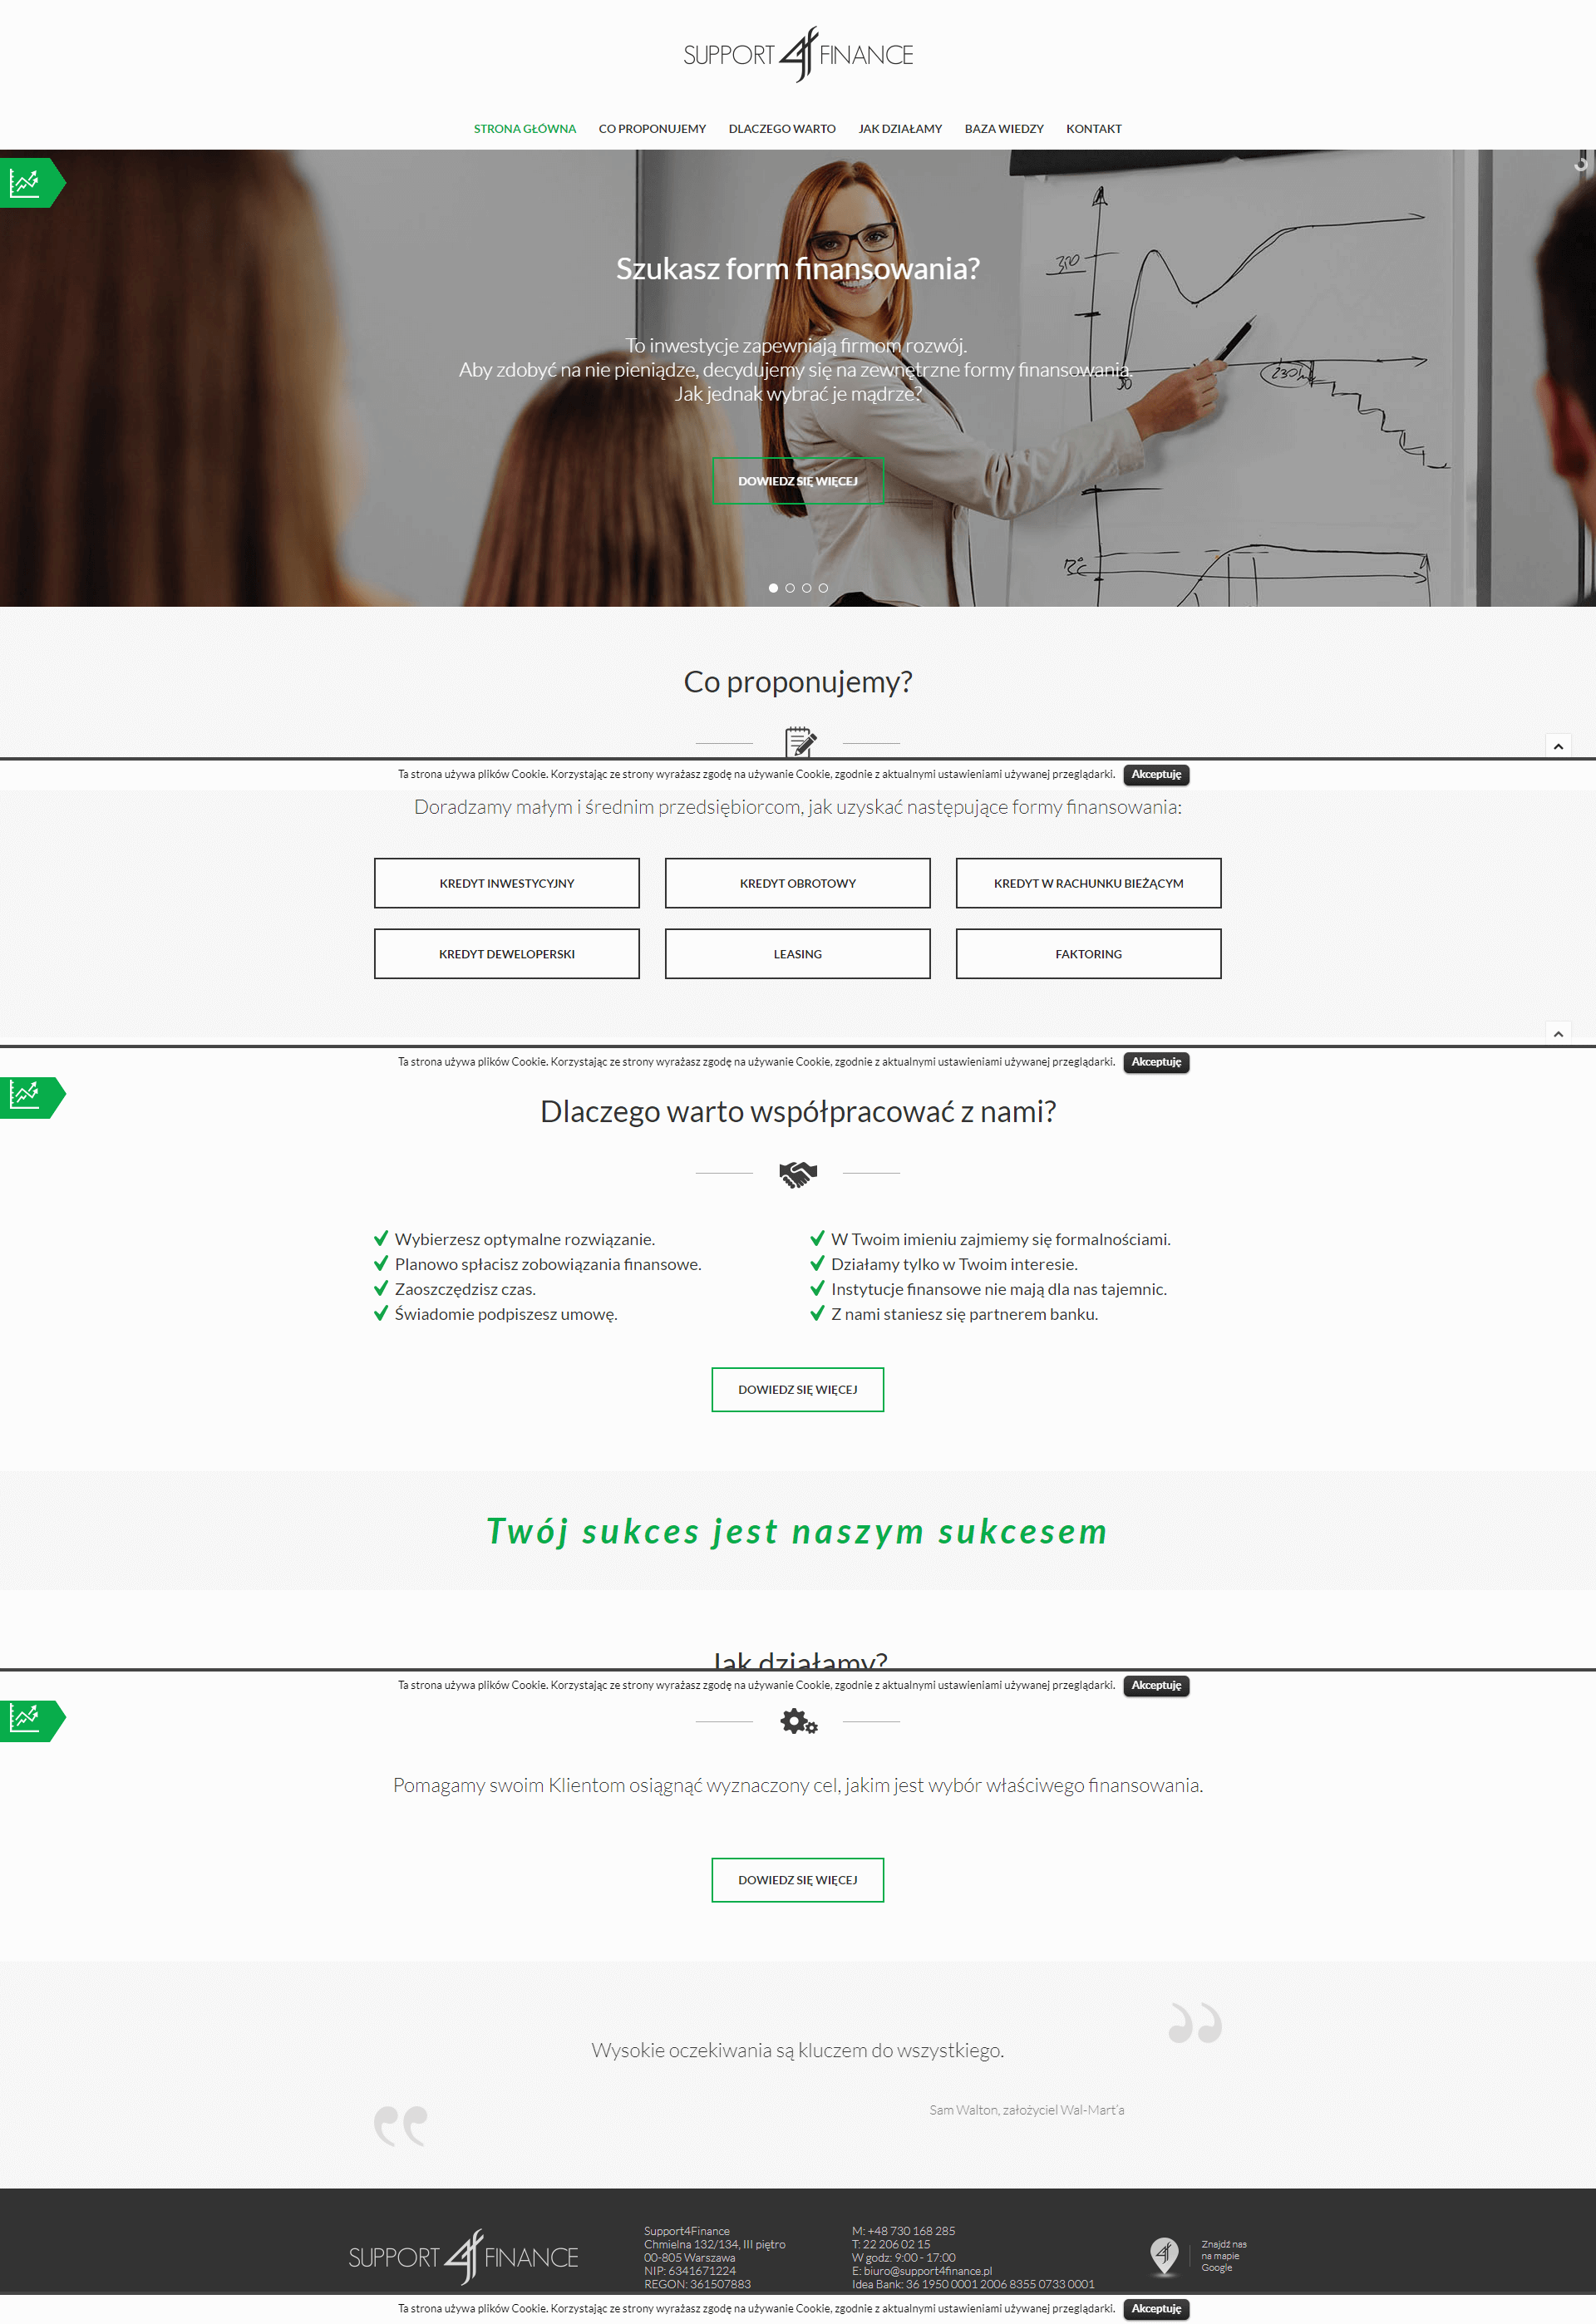 support4finance